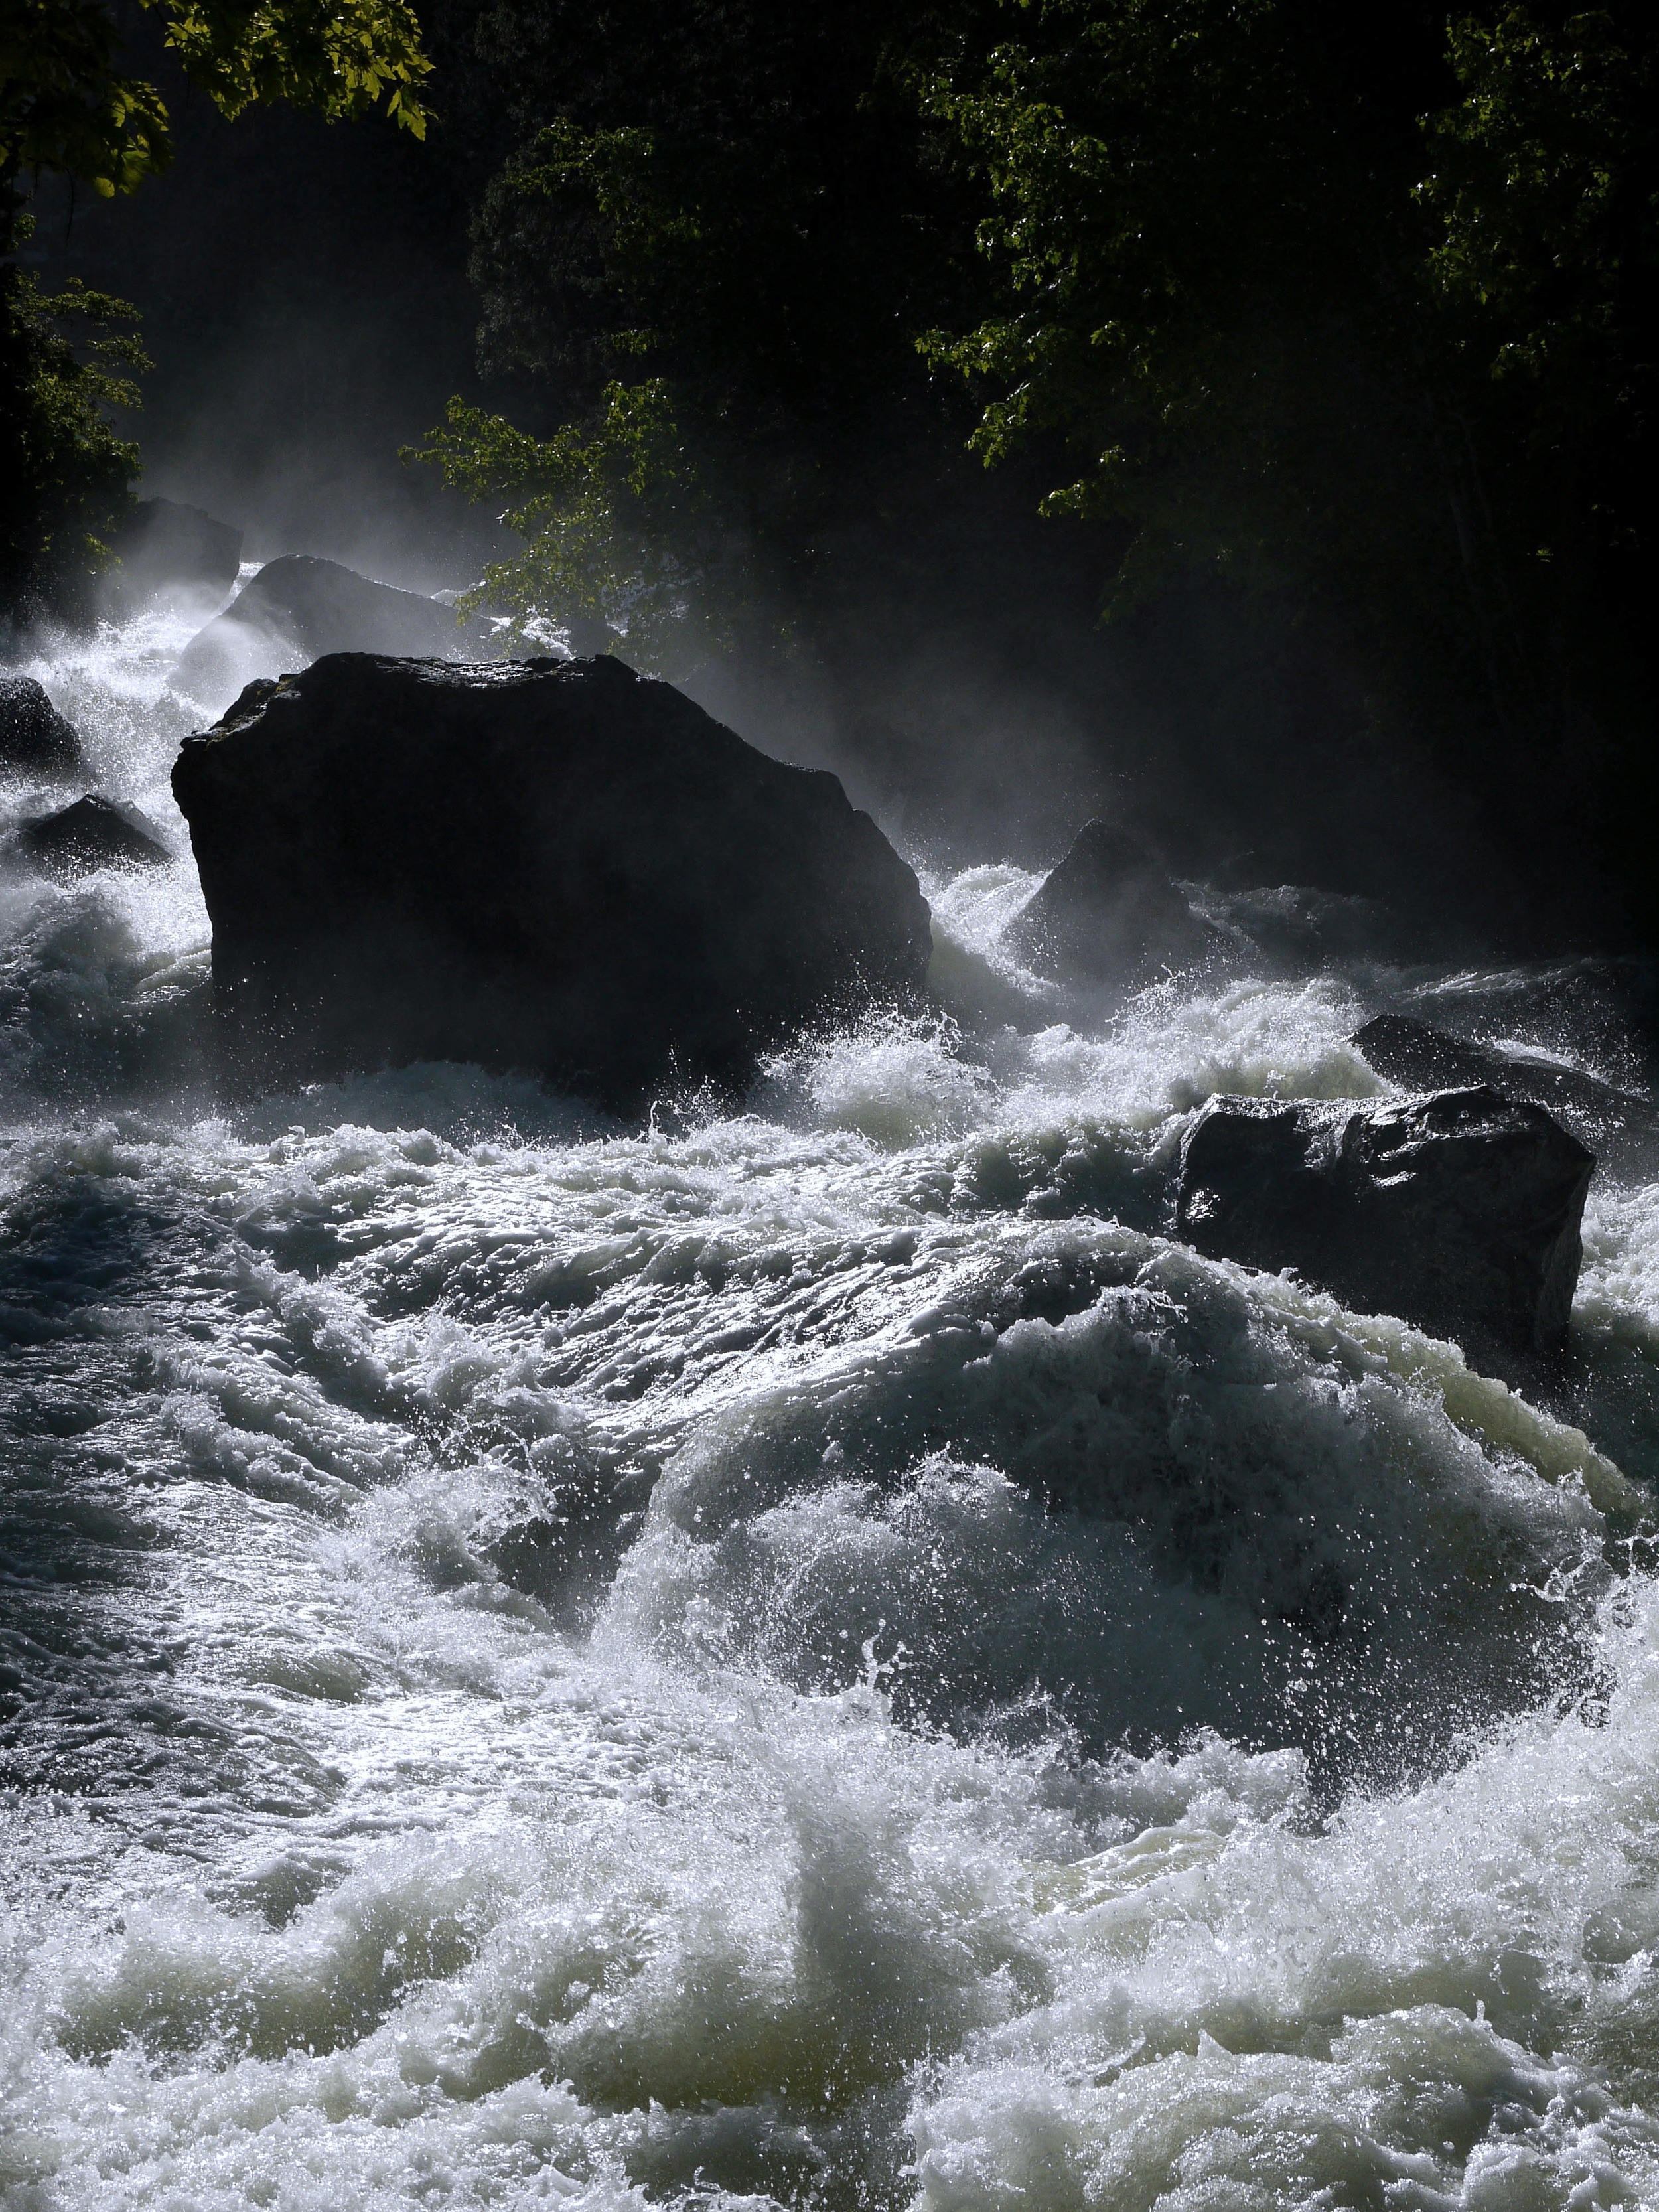 The Merced River below Vernal Fall.